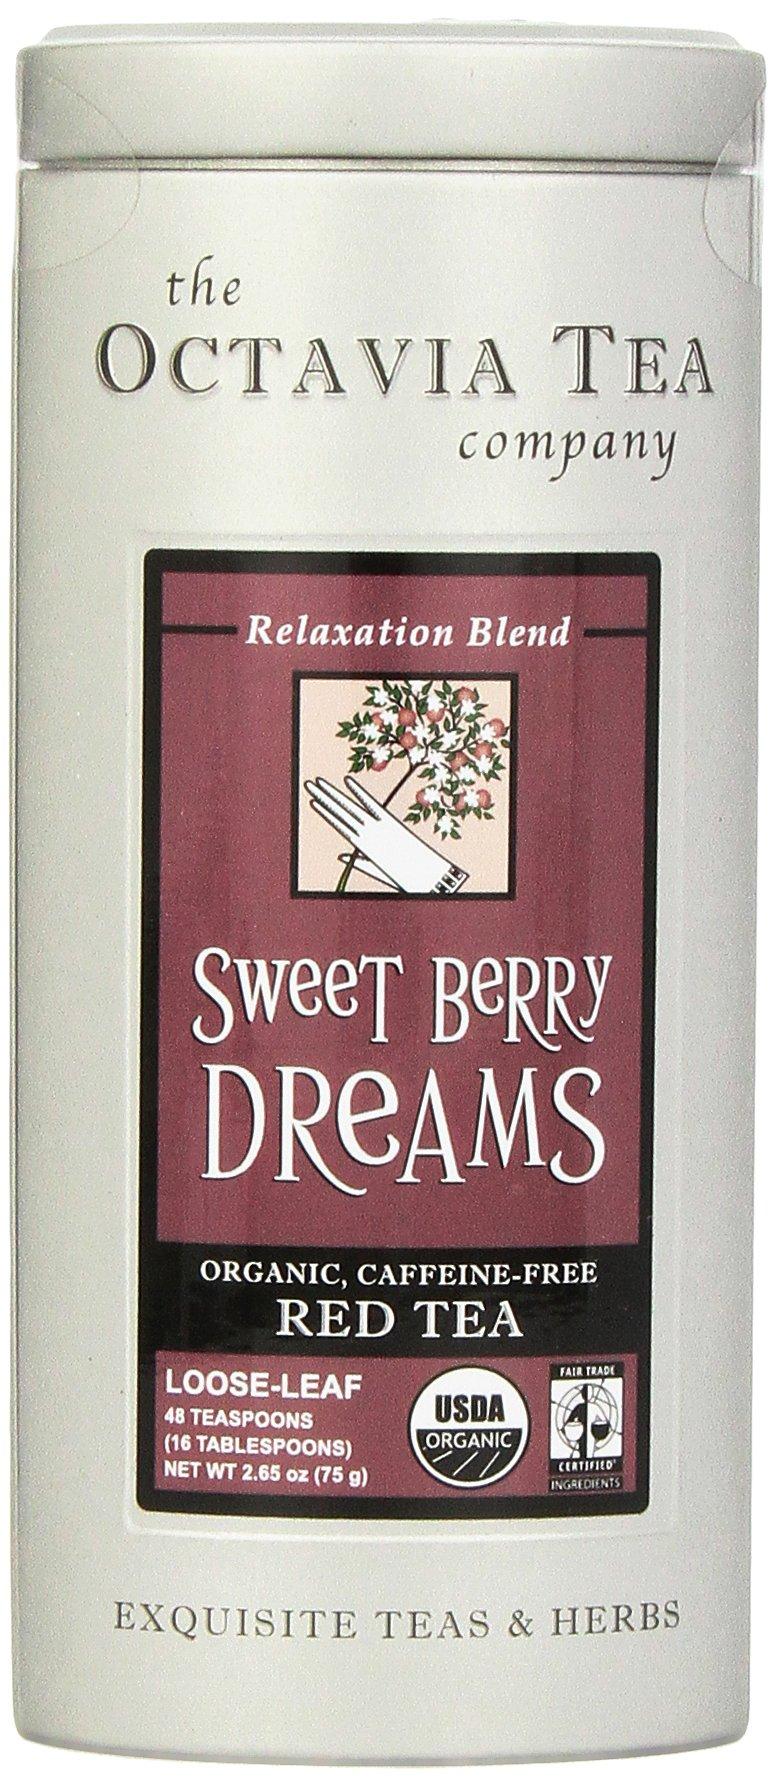 Octavia Tea Sweet Berry Dreams (Organic, Caffeine-Free Red Tea/Rooibos) Loose Tea, 2.65 Ounce Tin by Octavia Tea